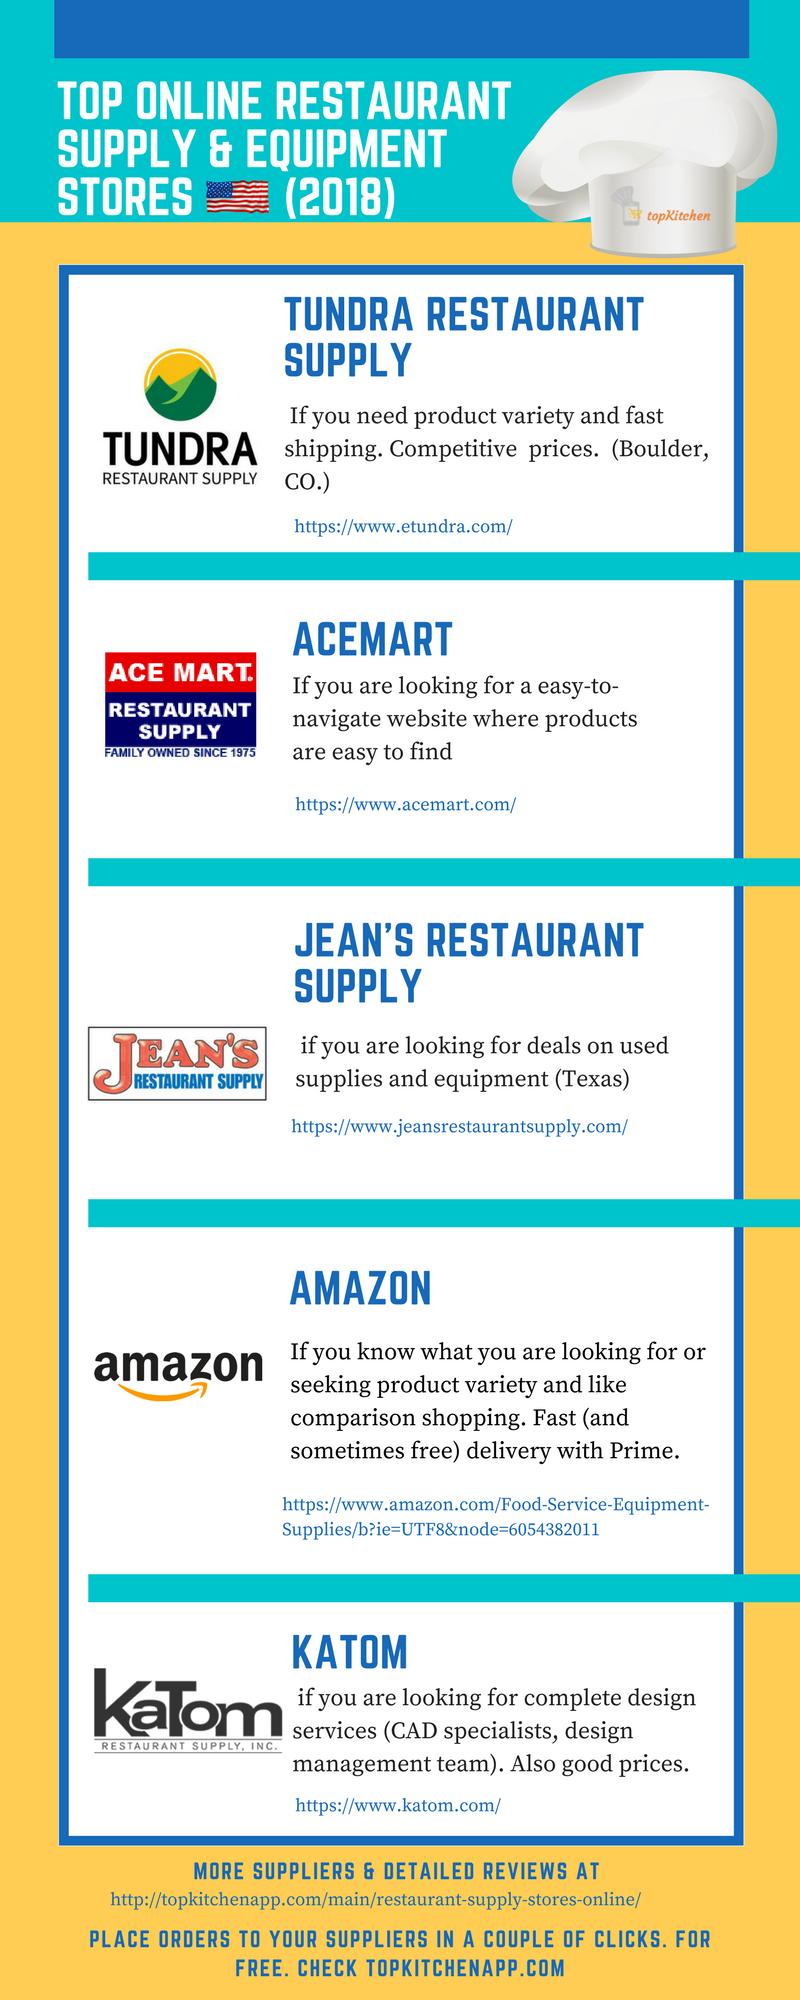 Top Online Restaurant Supply Equipment Stores Us 2018